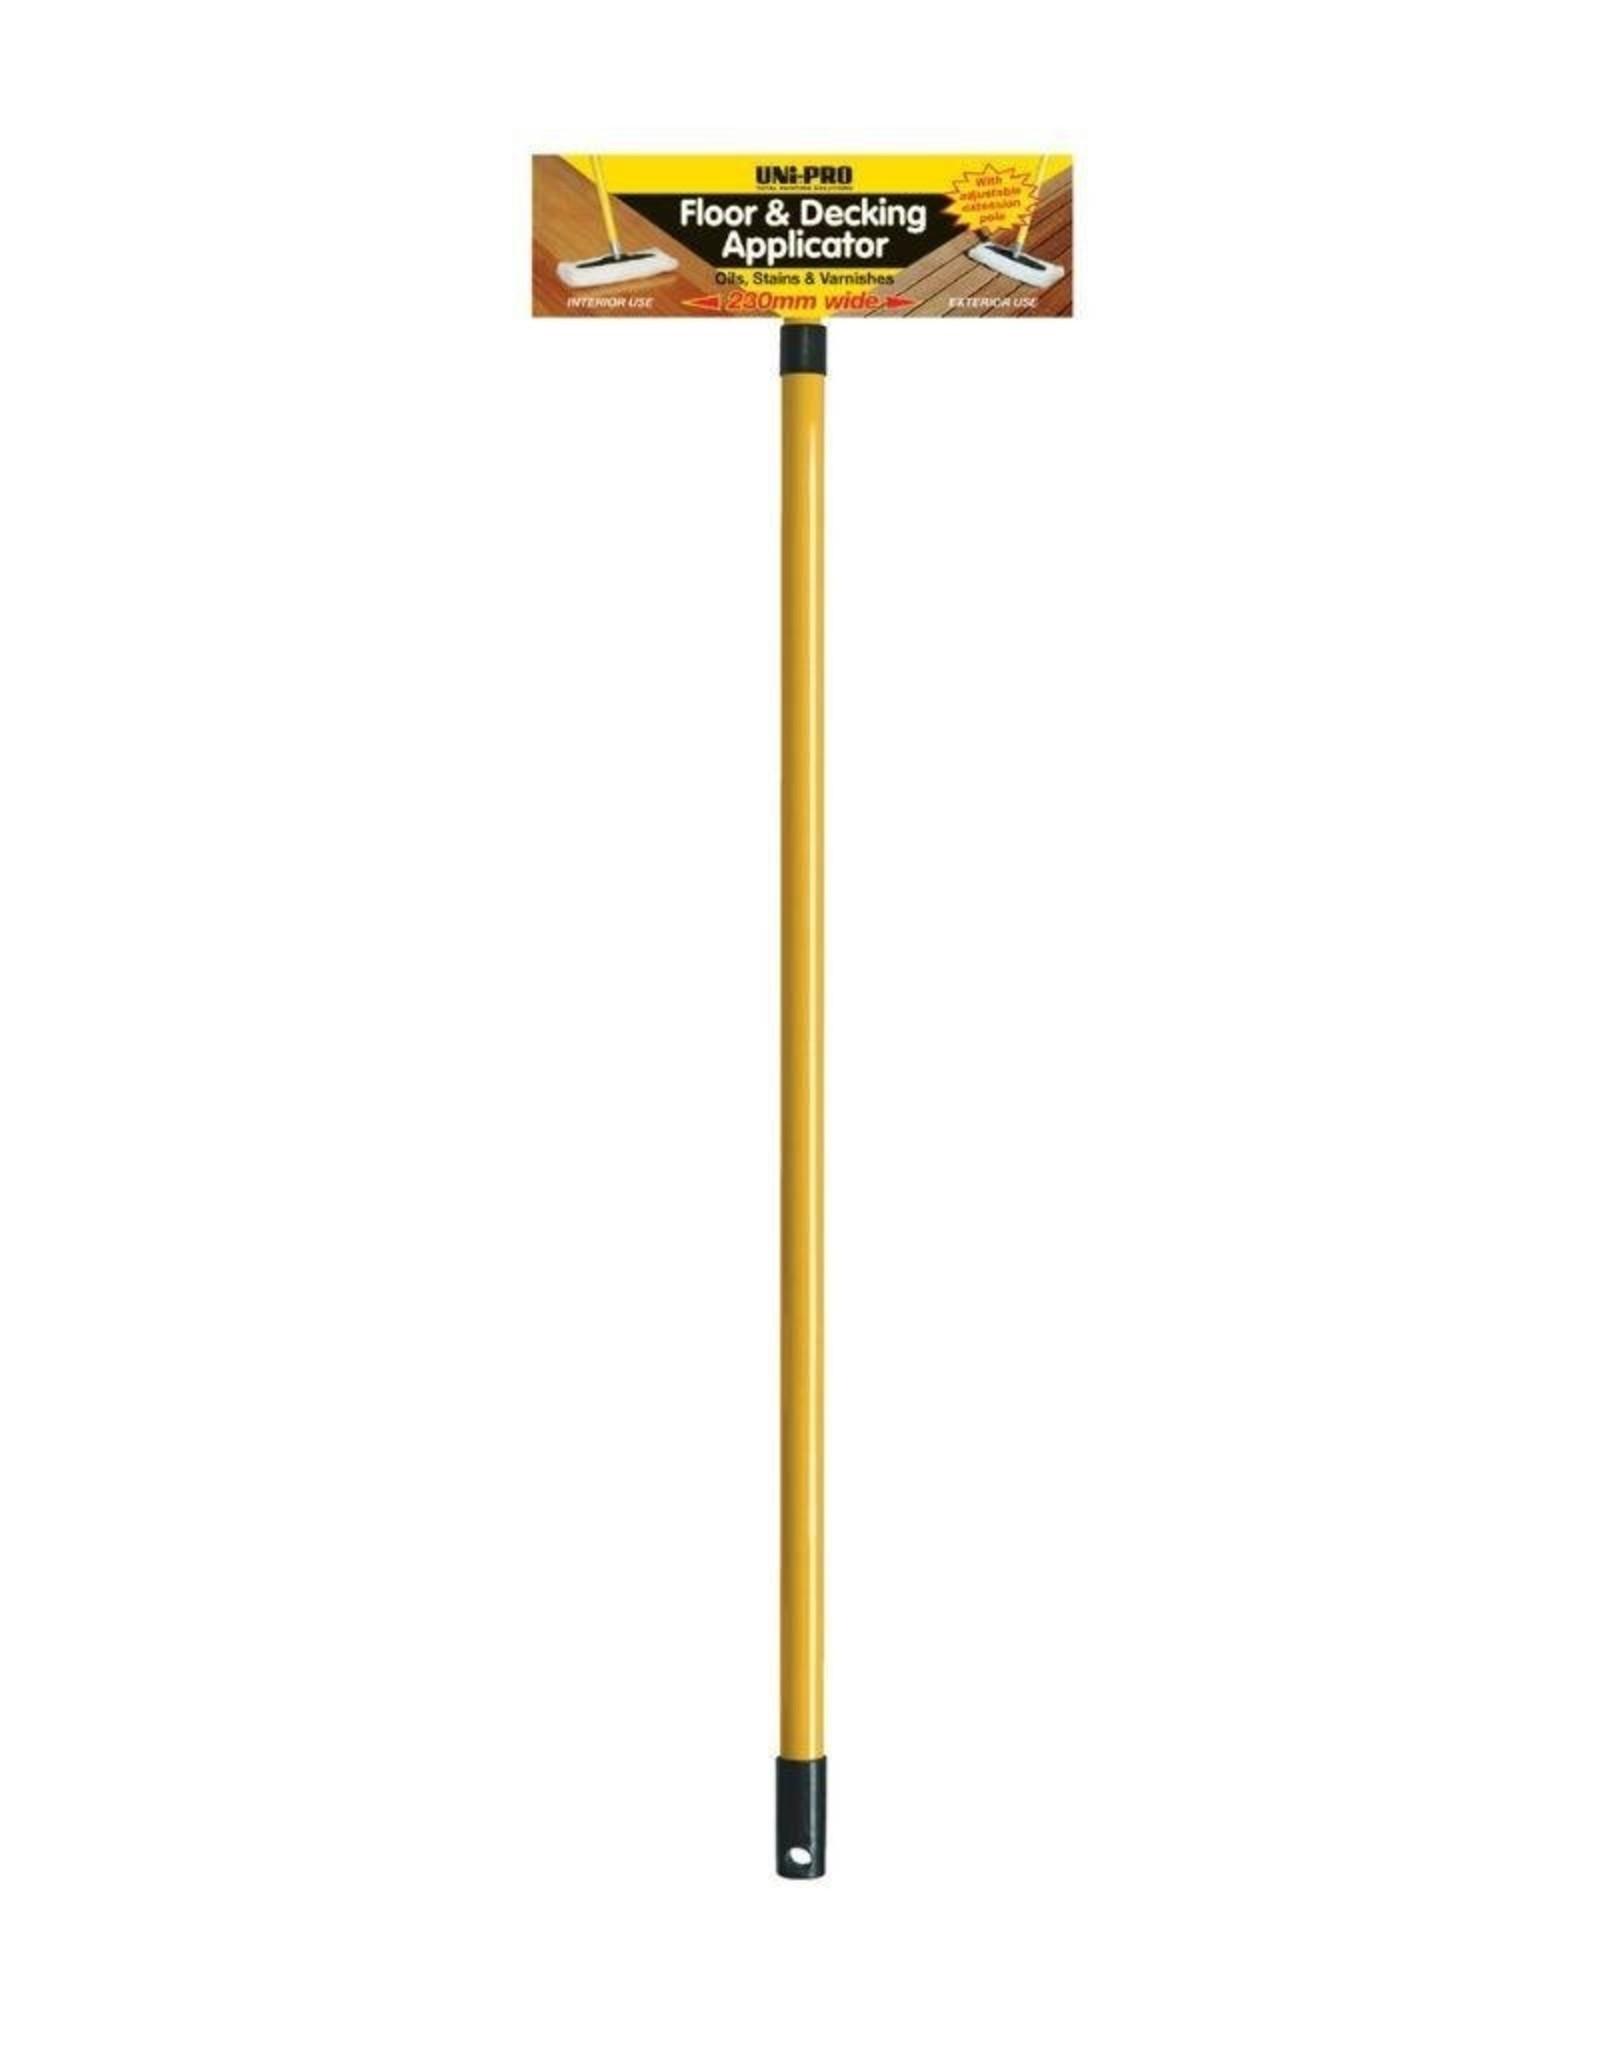 UNI-PRO Floor & Deck Applicator